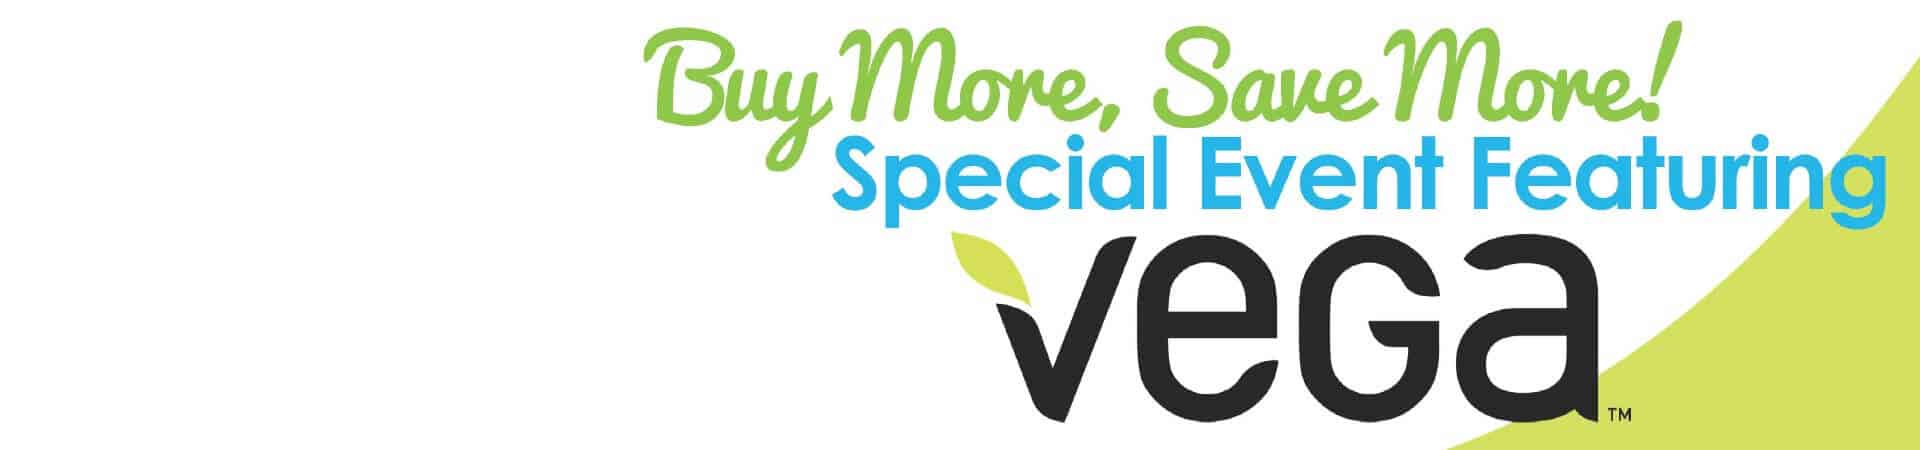 The-Buy-More-Save-More-Vega-Sport-Event-at-Nature's-Emporium